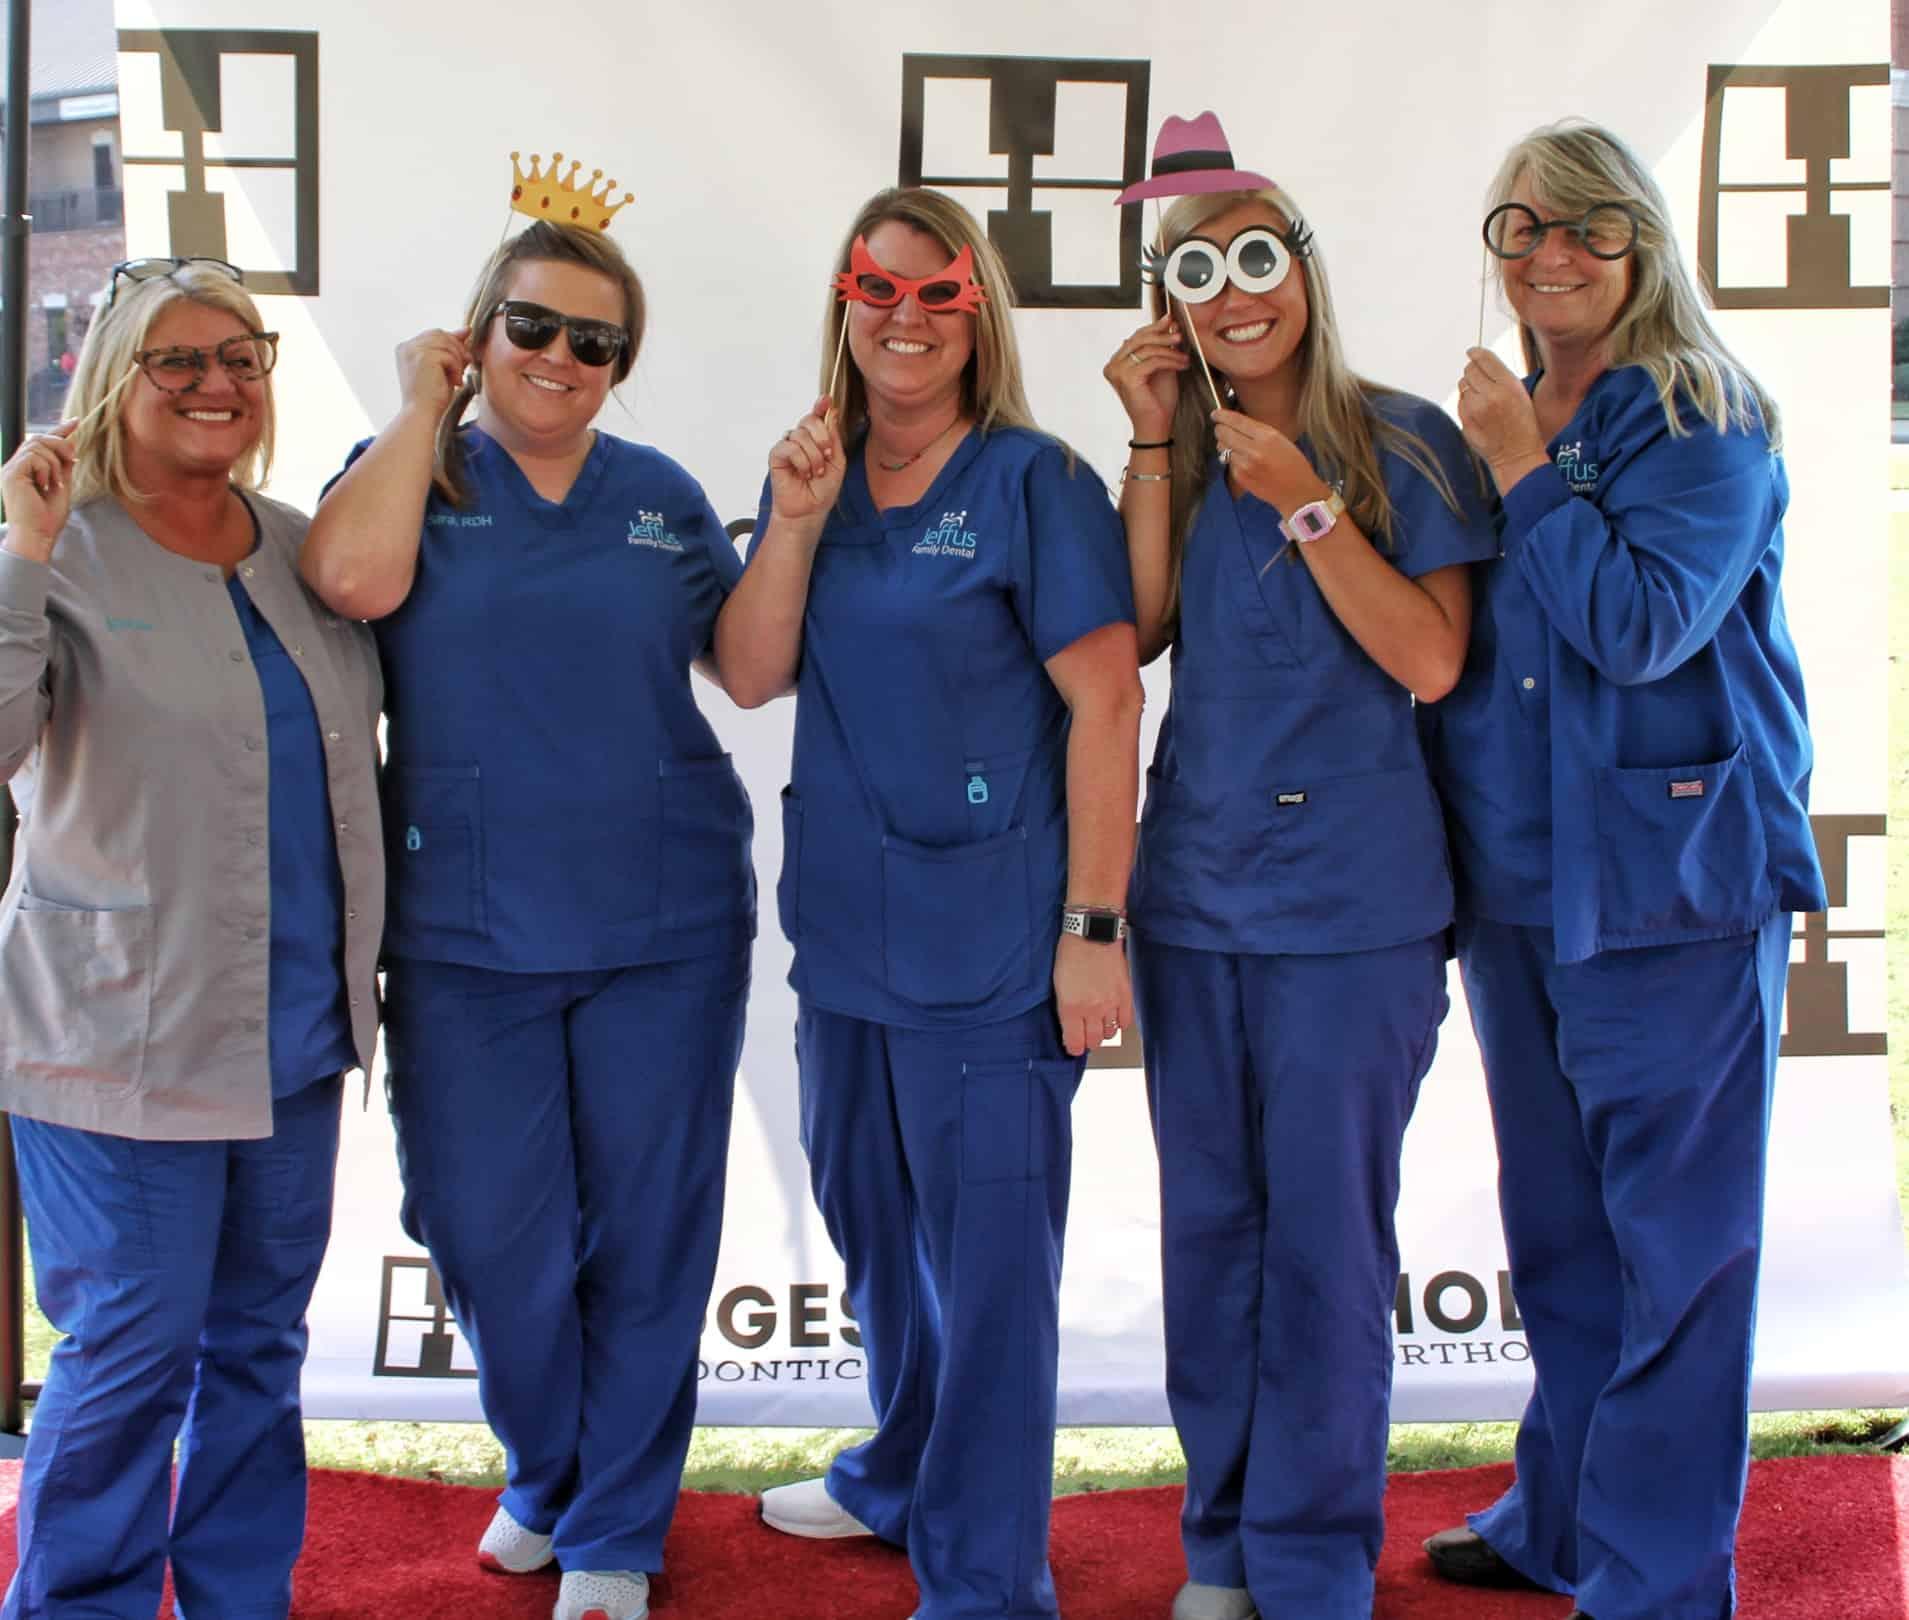 18010929-480F-482F-80A1-75FEAEEB583C 2019 Hodges Orthodontics BBQ